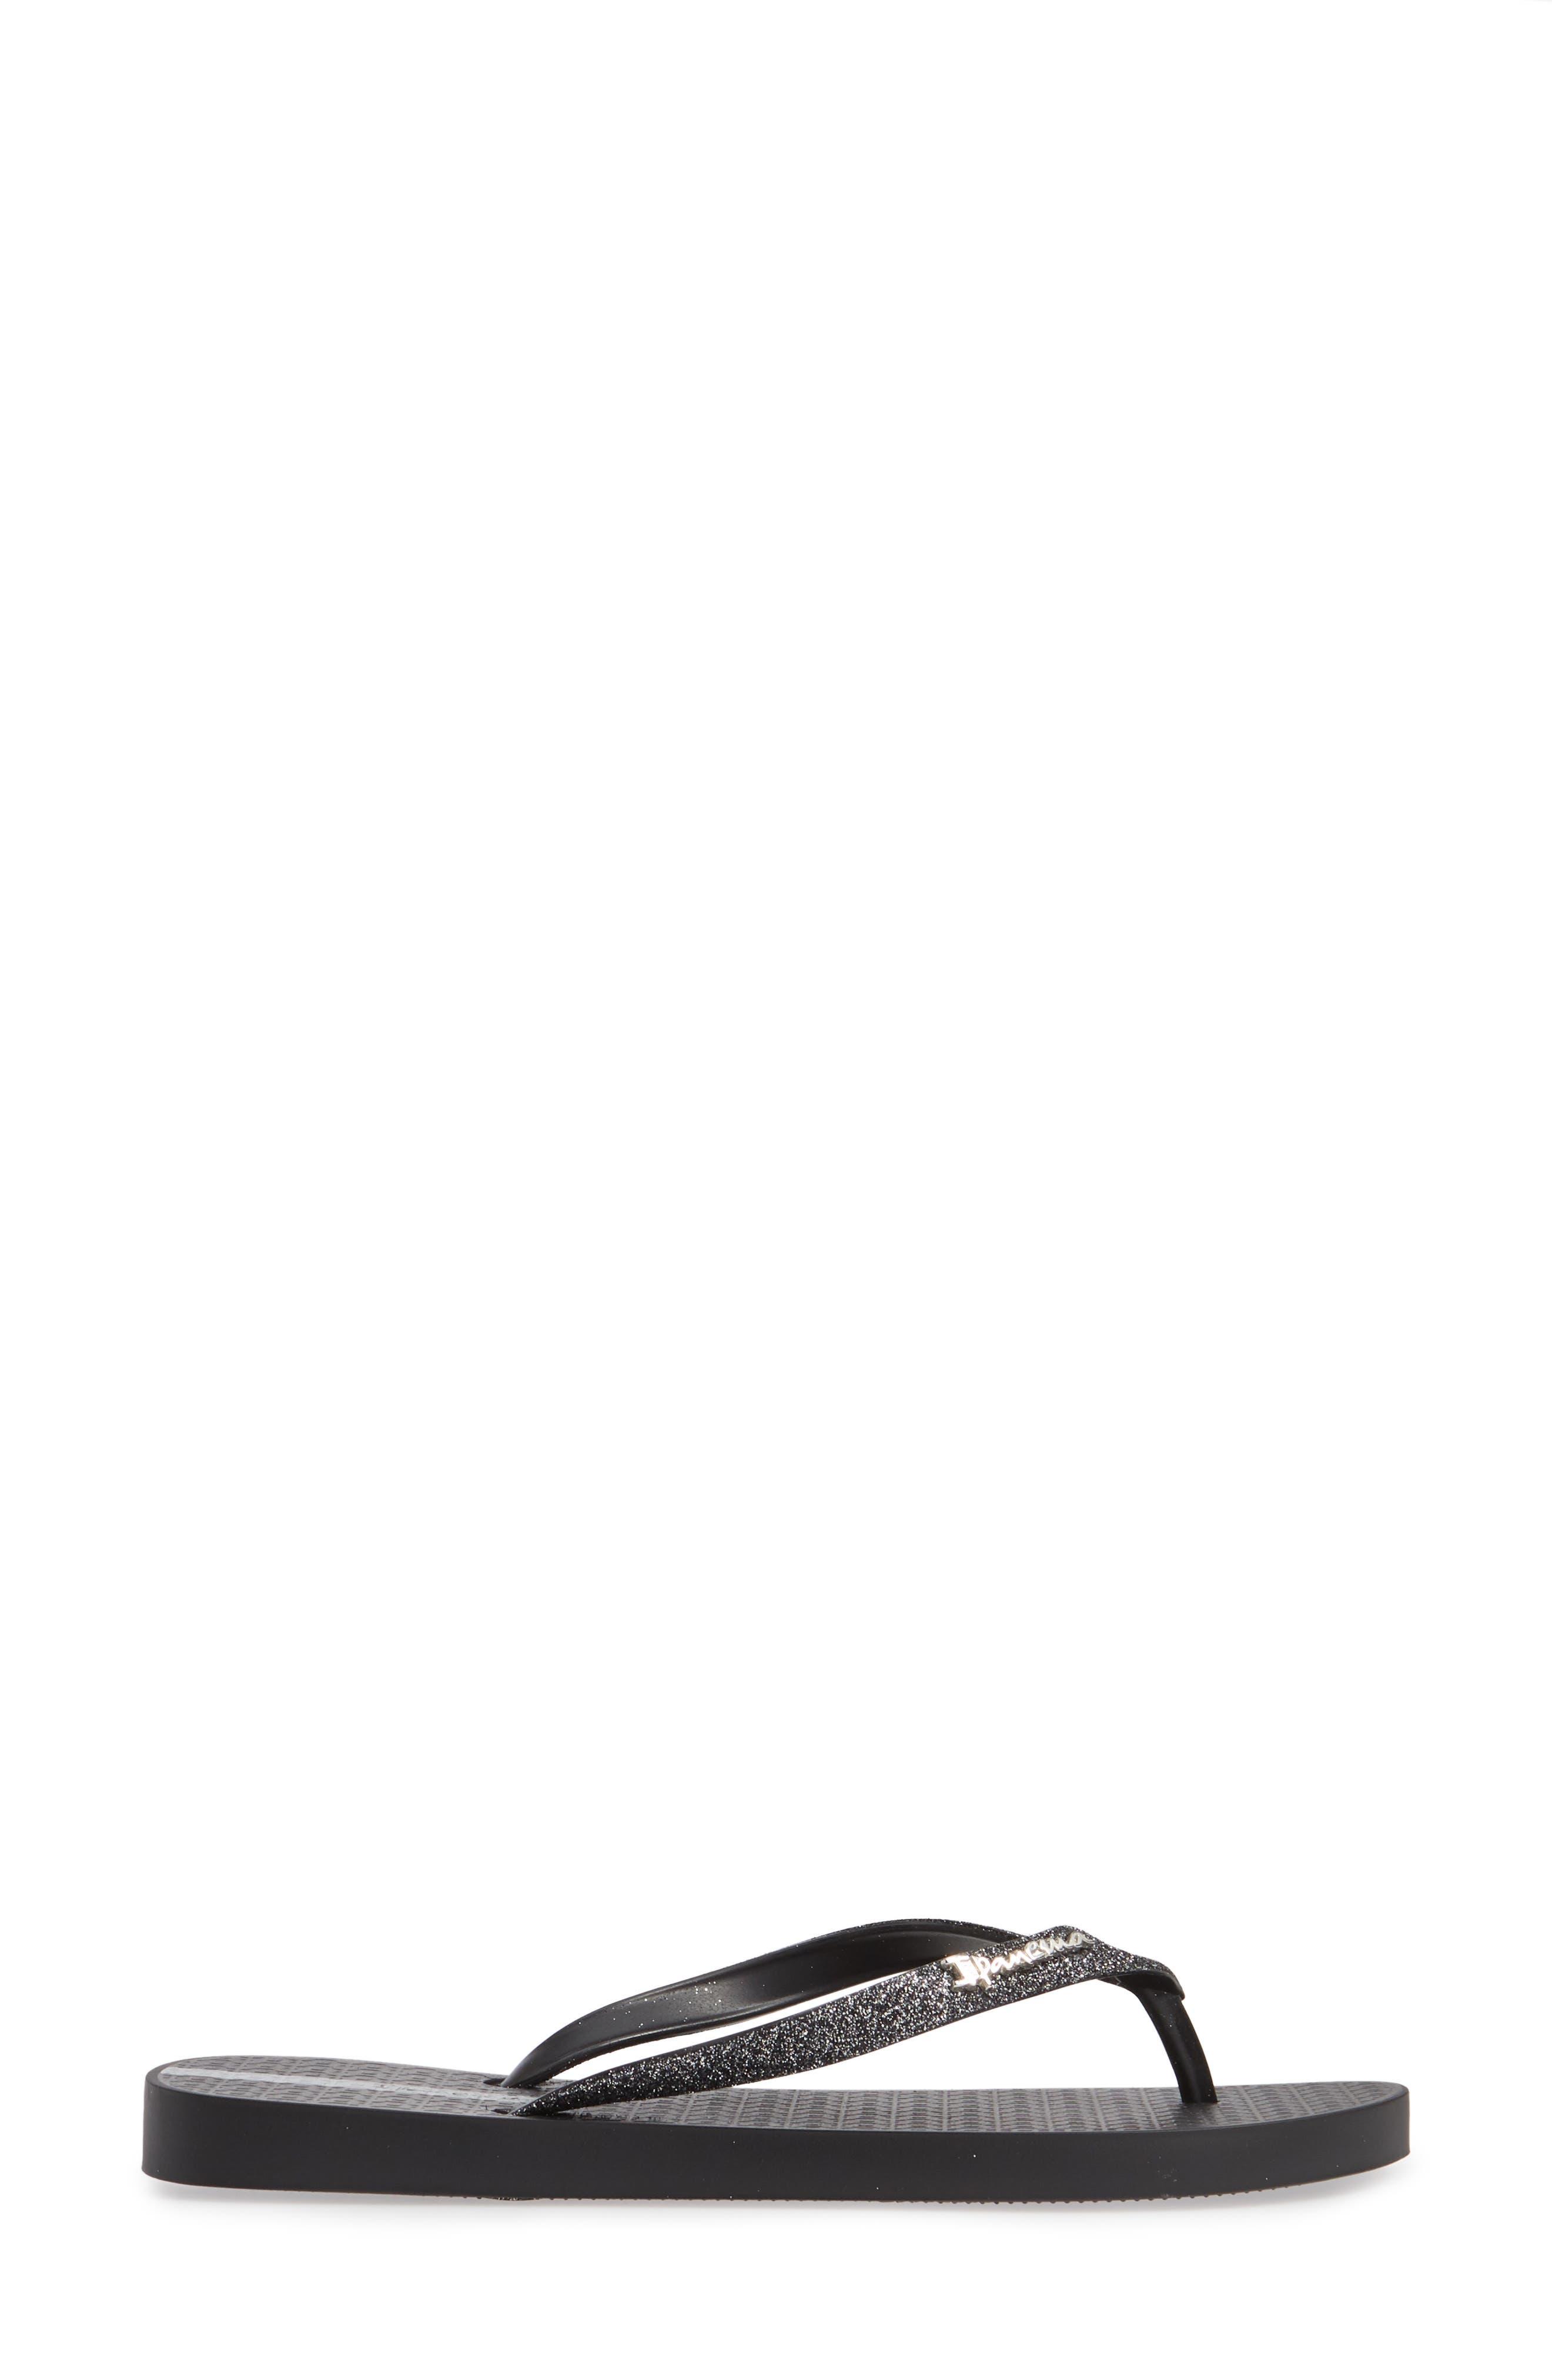 IPANEMA, 'Glitter' Flip Flop, Alternate thumbnail 3, color, BLACK/ BLACK